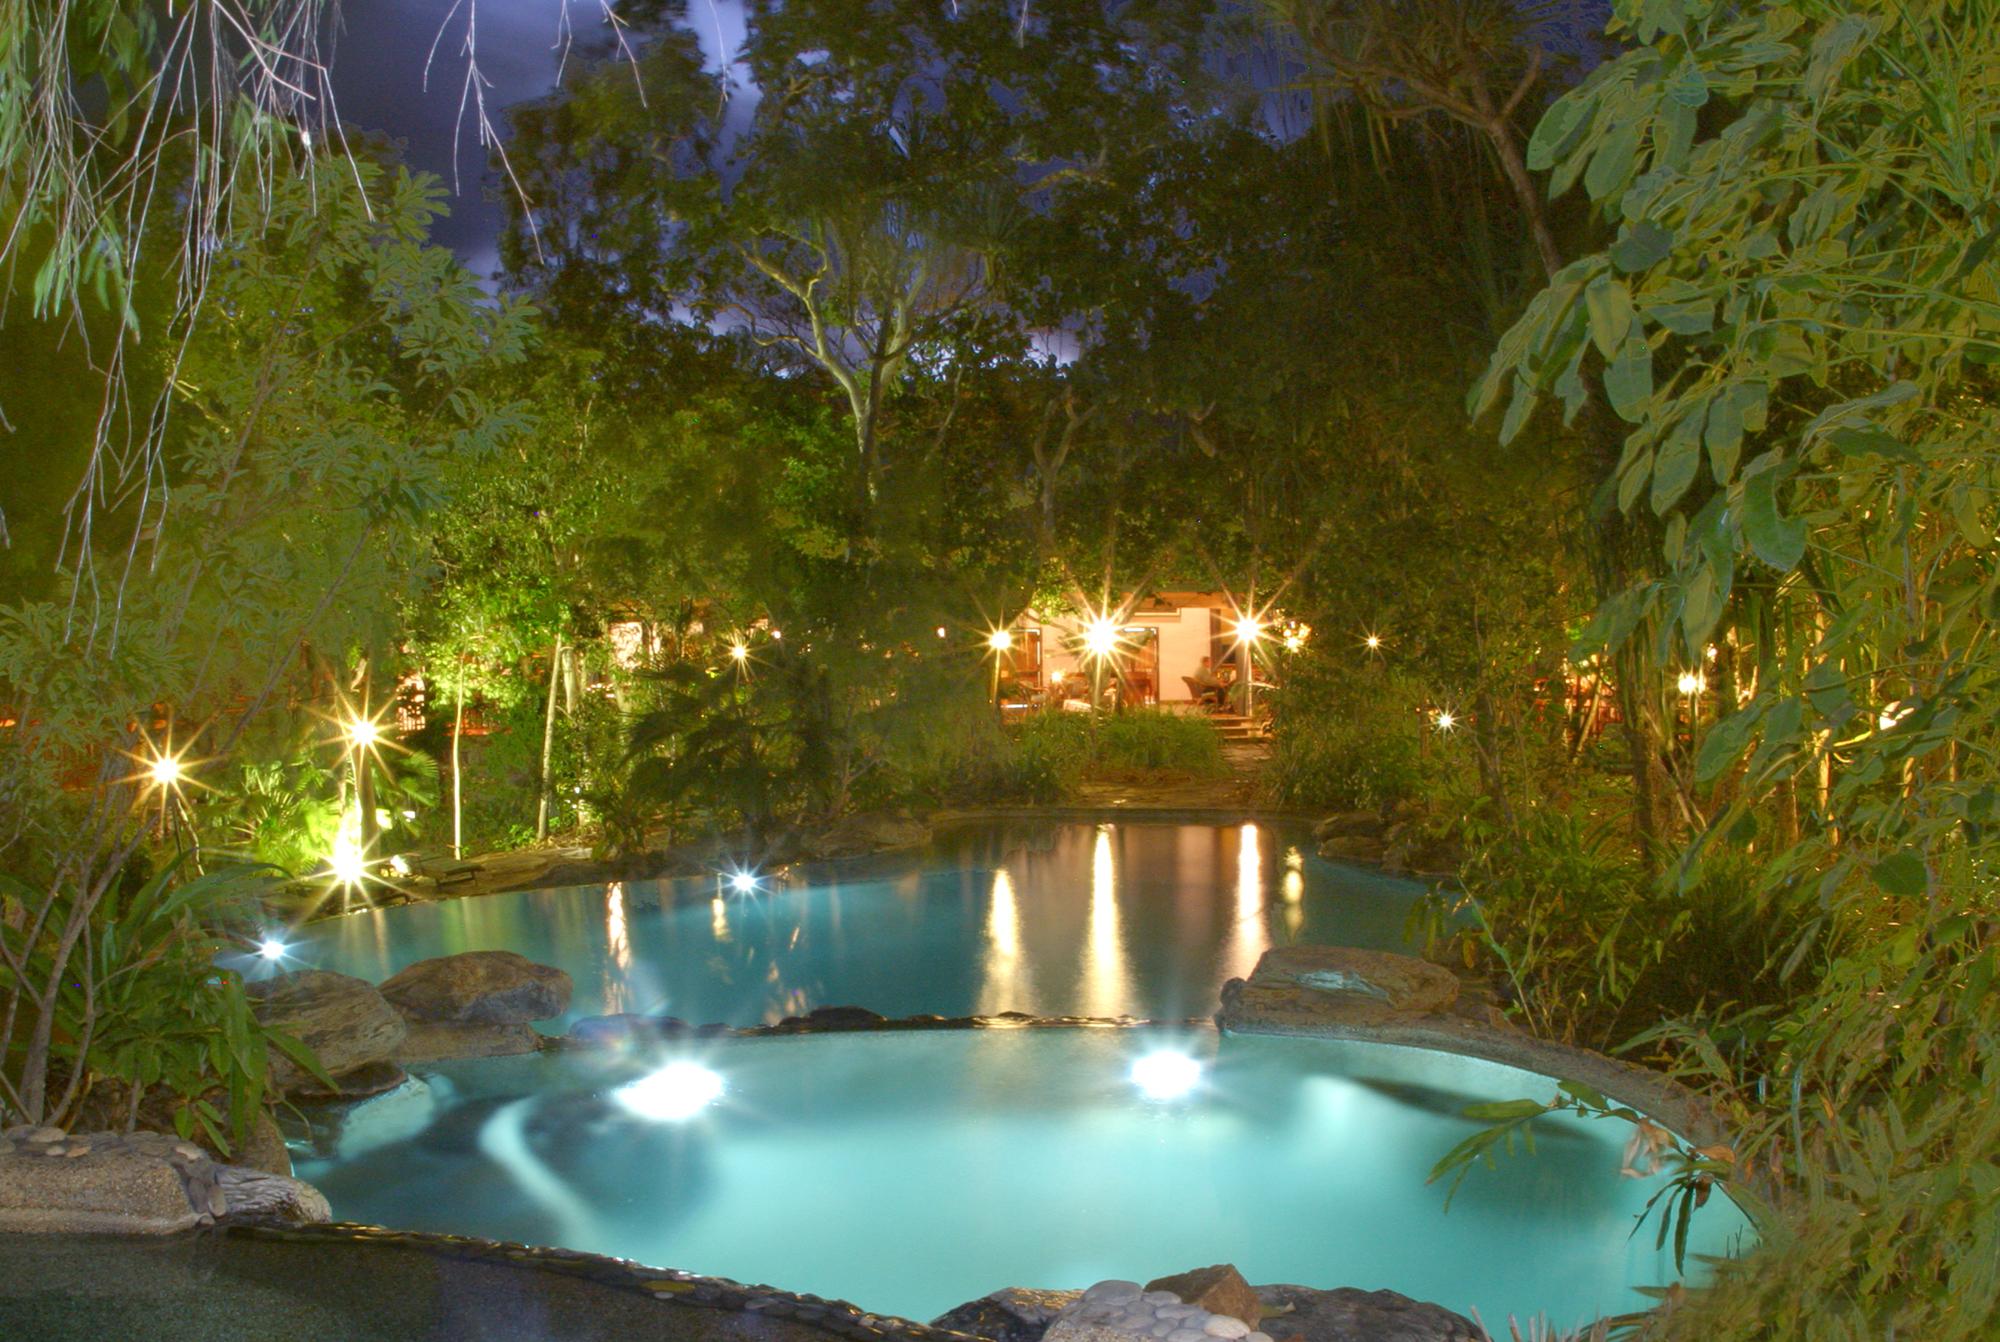 http://www.thalabeach.com.au/wp-content/uploads/2010/07/spa-pool-at-night2.jpg